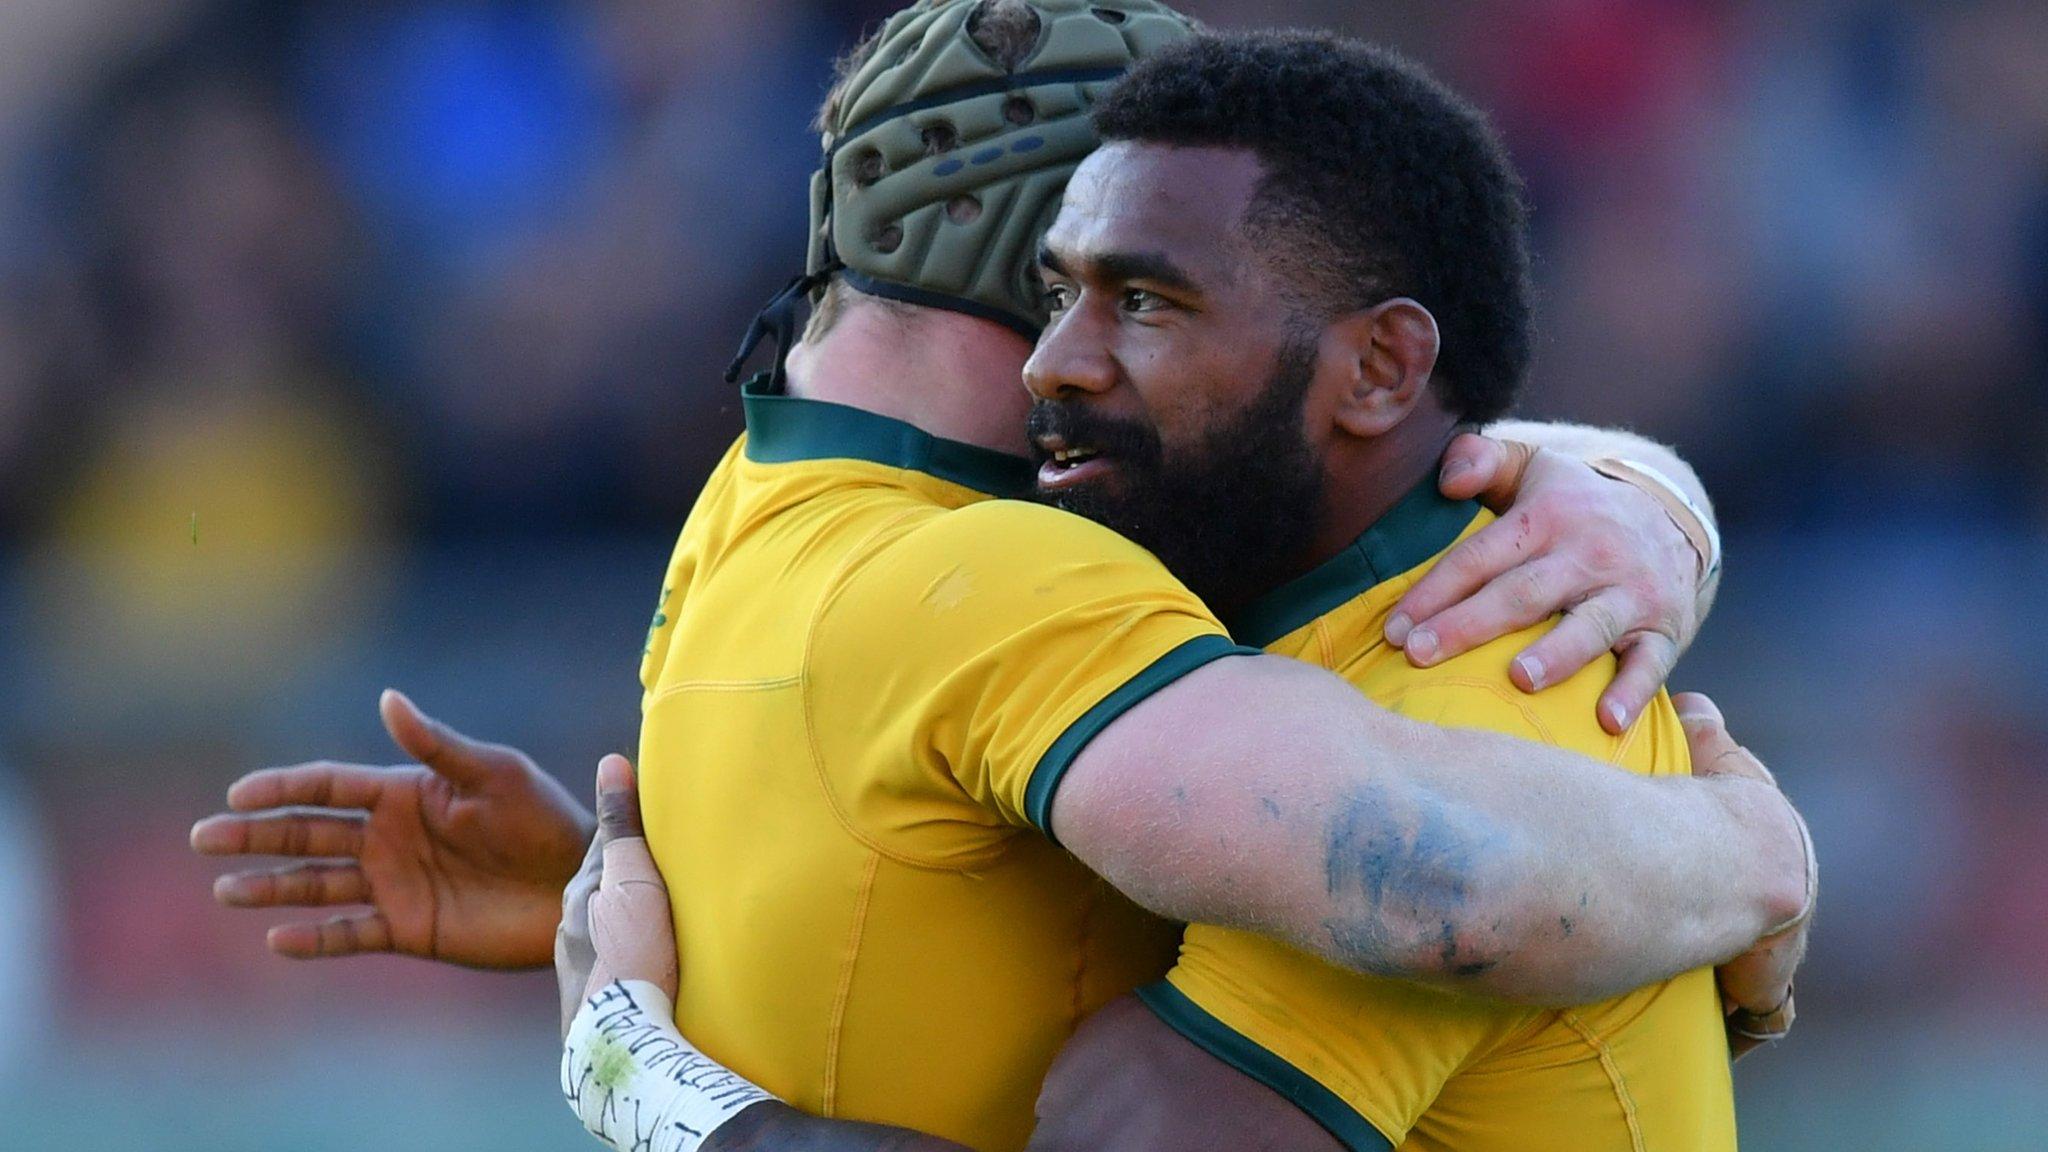 'We love going to Twickenham' - Australia prepare for England with Italy win